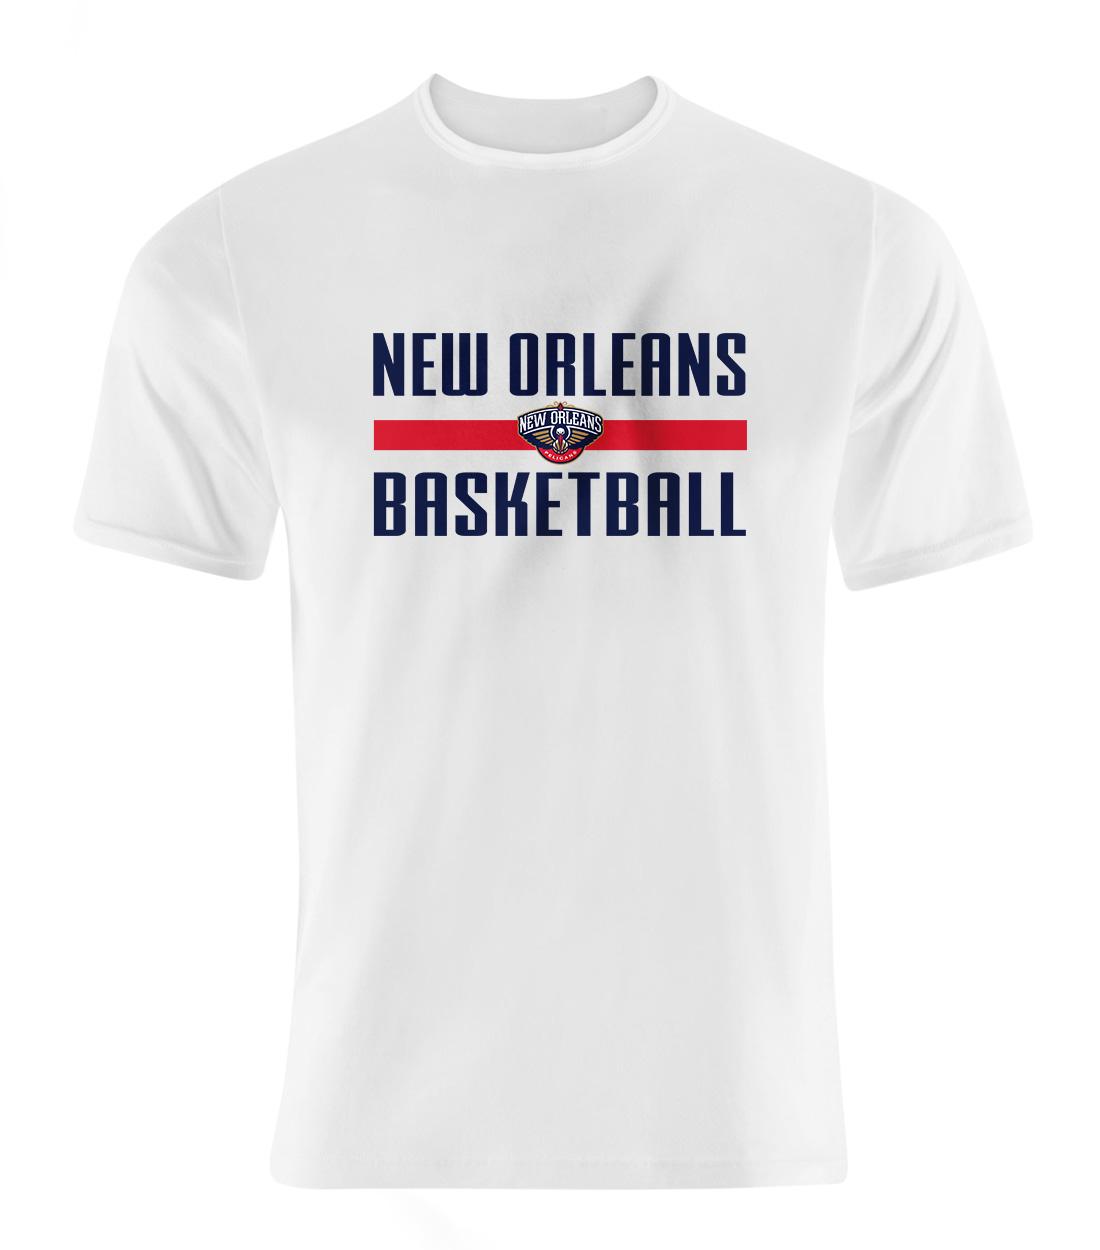 New Orleans Basketball Tshirt (TSH-WHT-SKR-orlns.bsktbll-530)